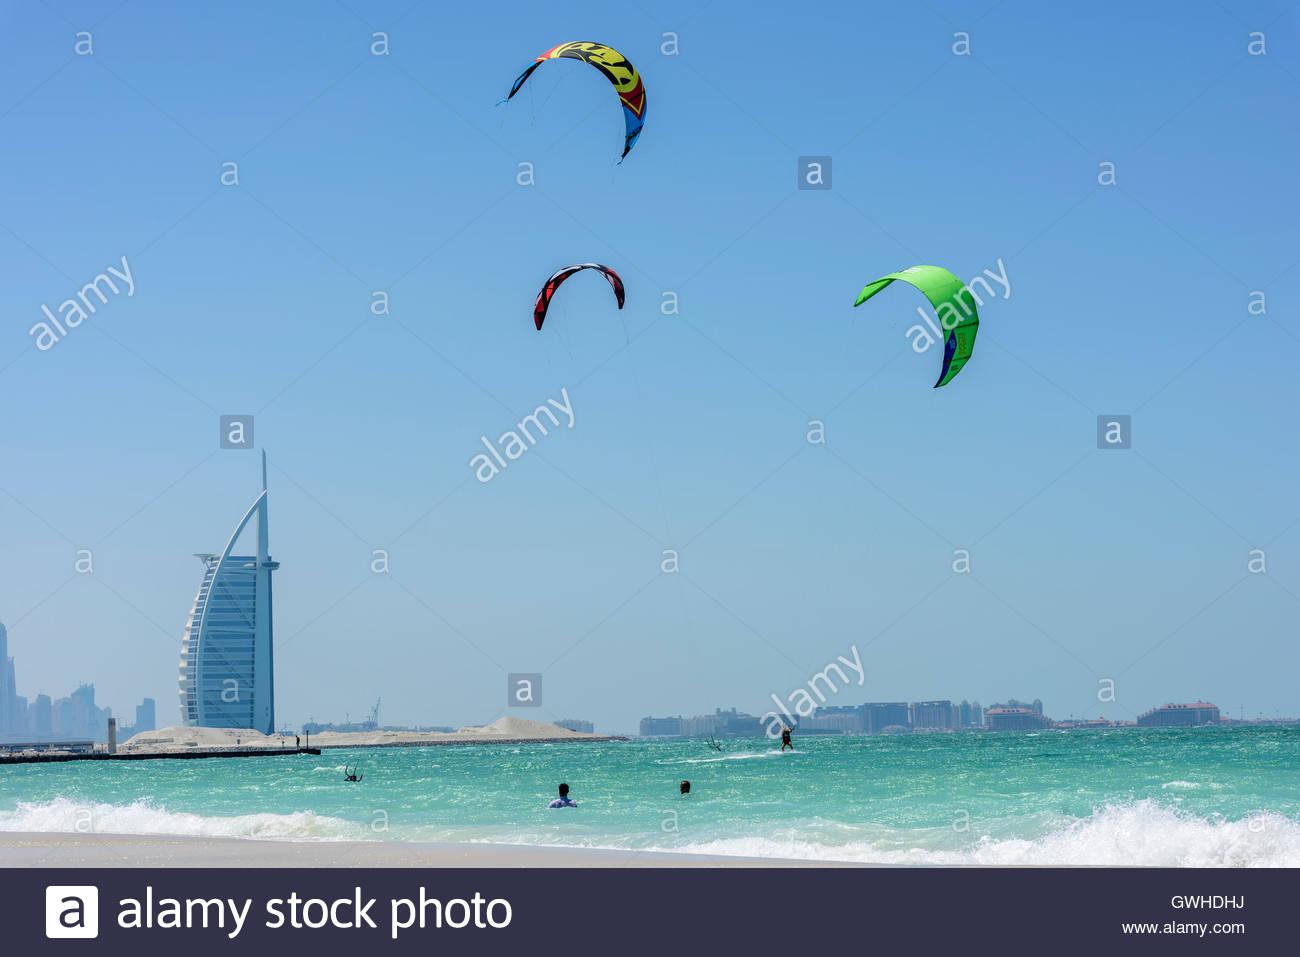 Kite Surf in Dubai with the famous Burj Al Arab hotel in background. No model/property releases. Dubai Emirates, Stock Photo